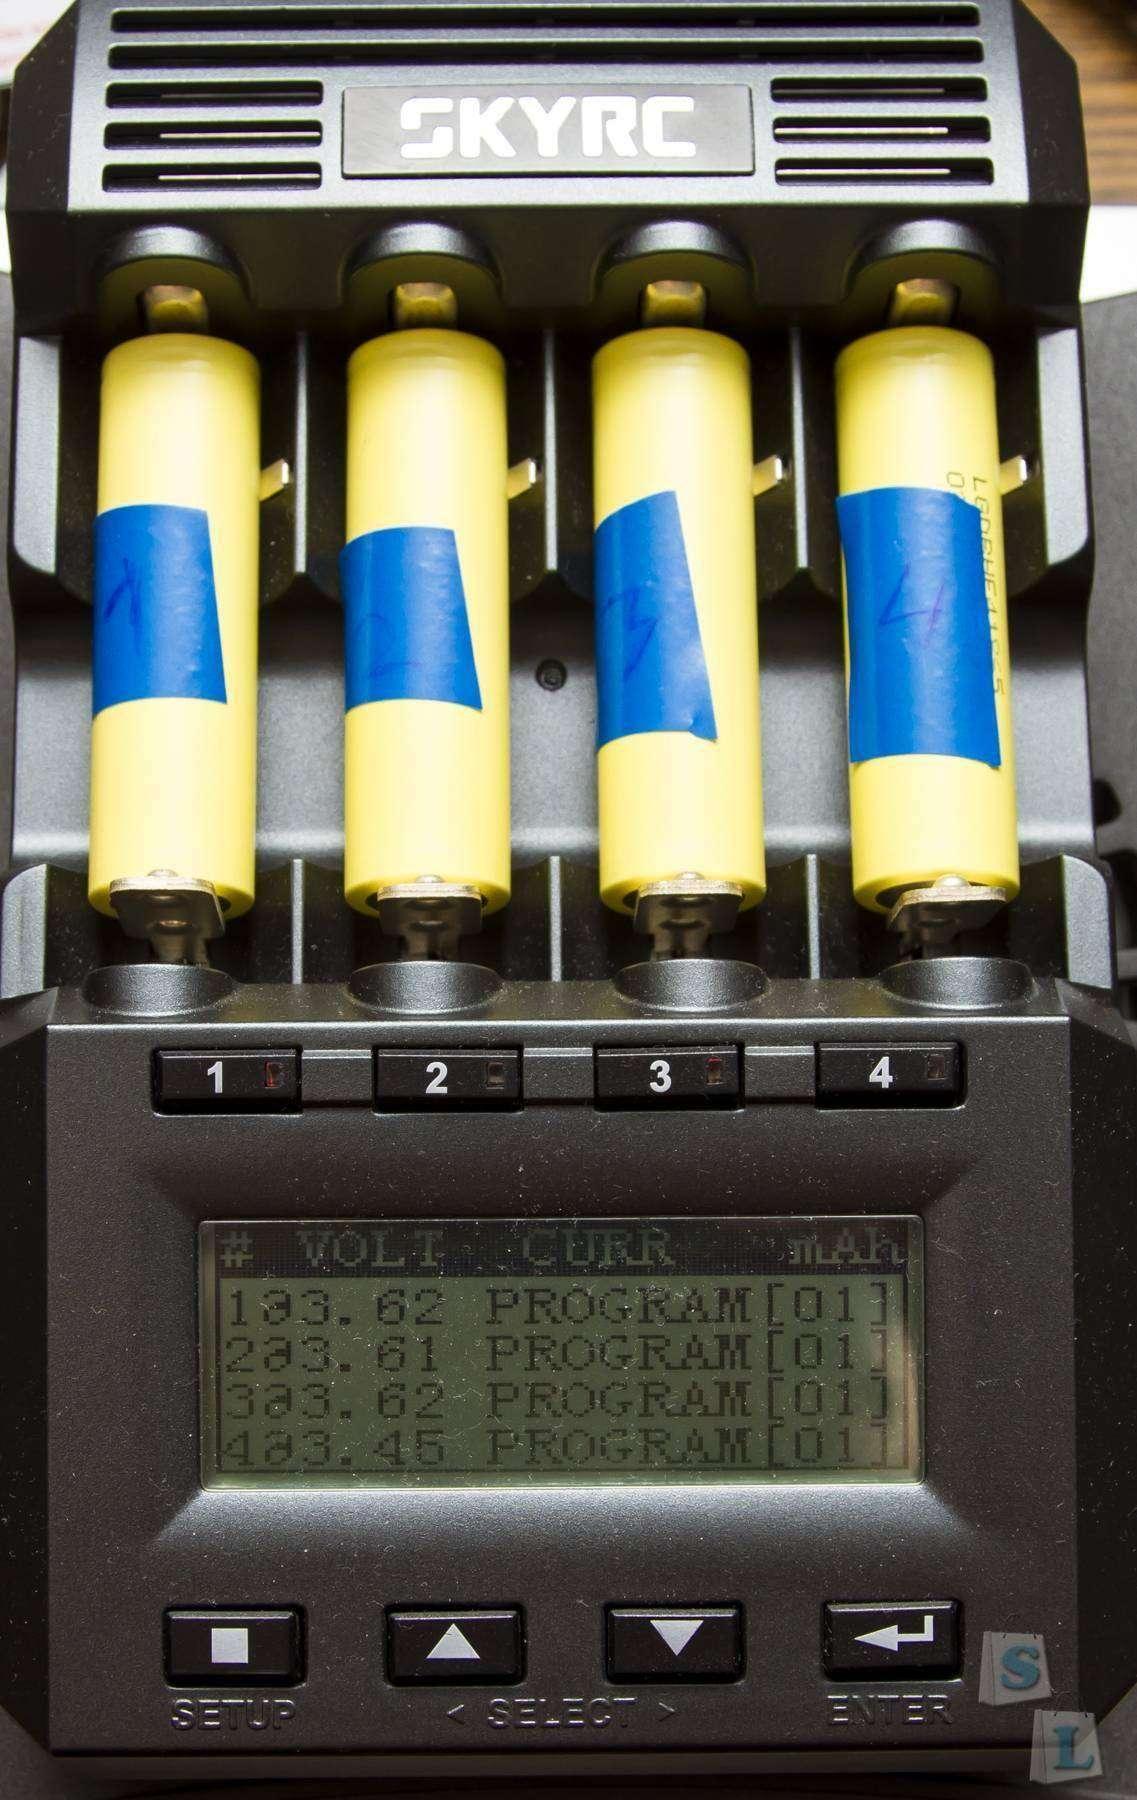 GearBest: Обзор и тестирование Li - ion аккумуляторов LG DBHE4 18650 2500mAh 20A